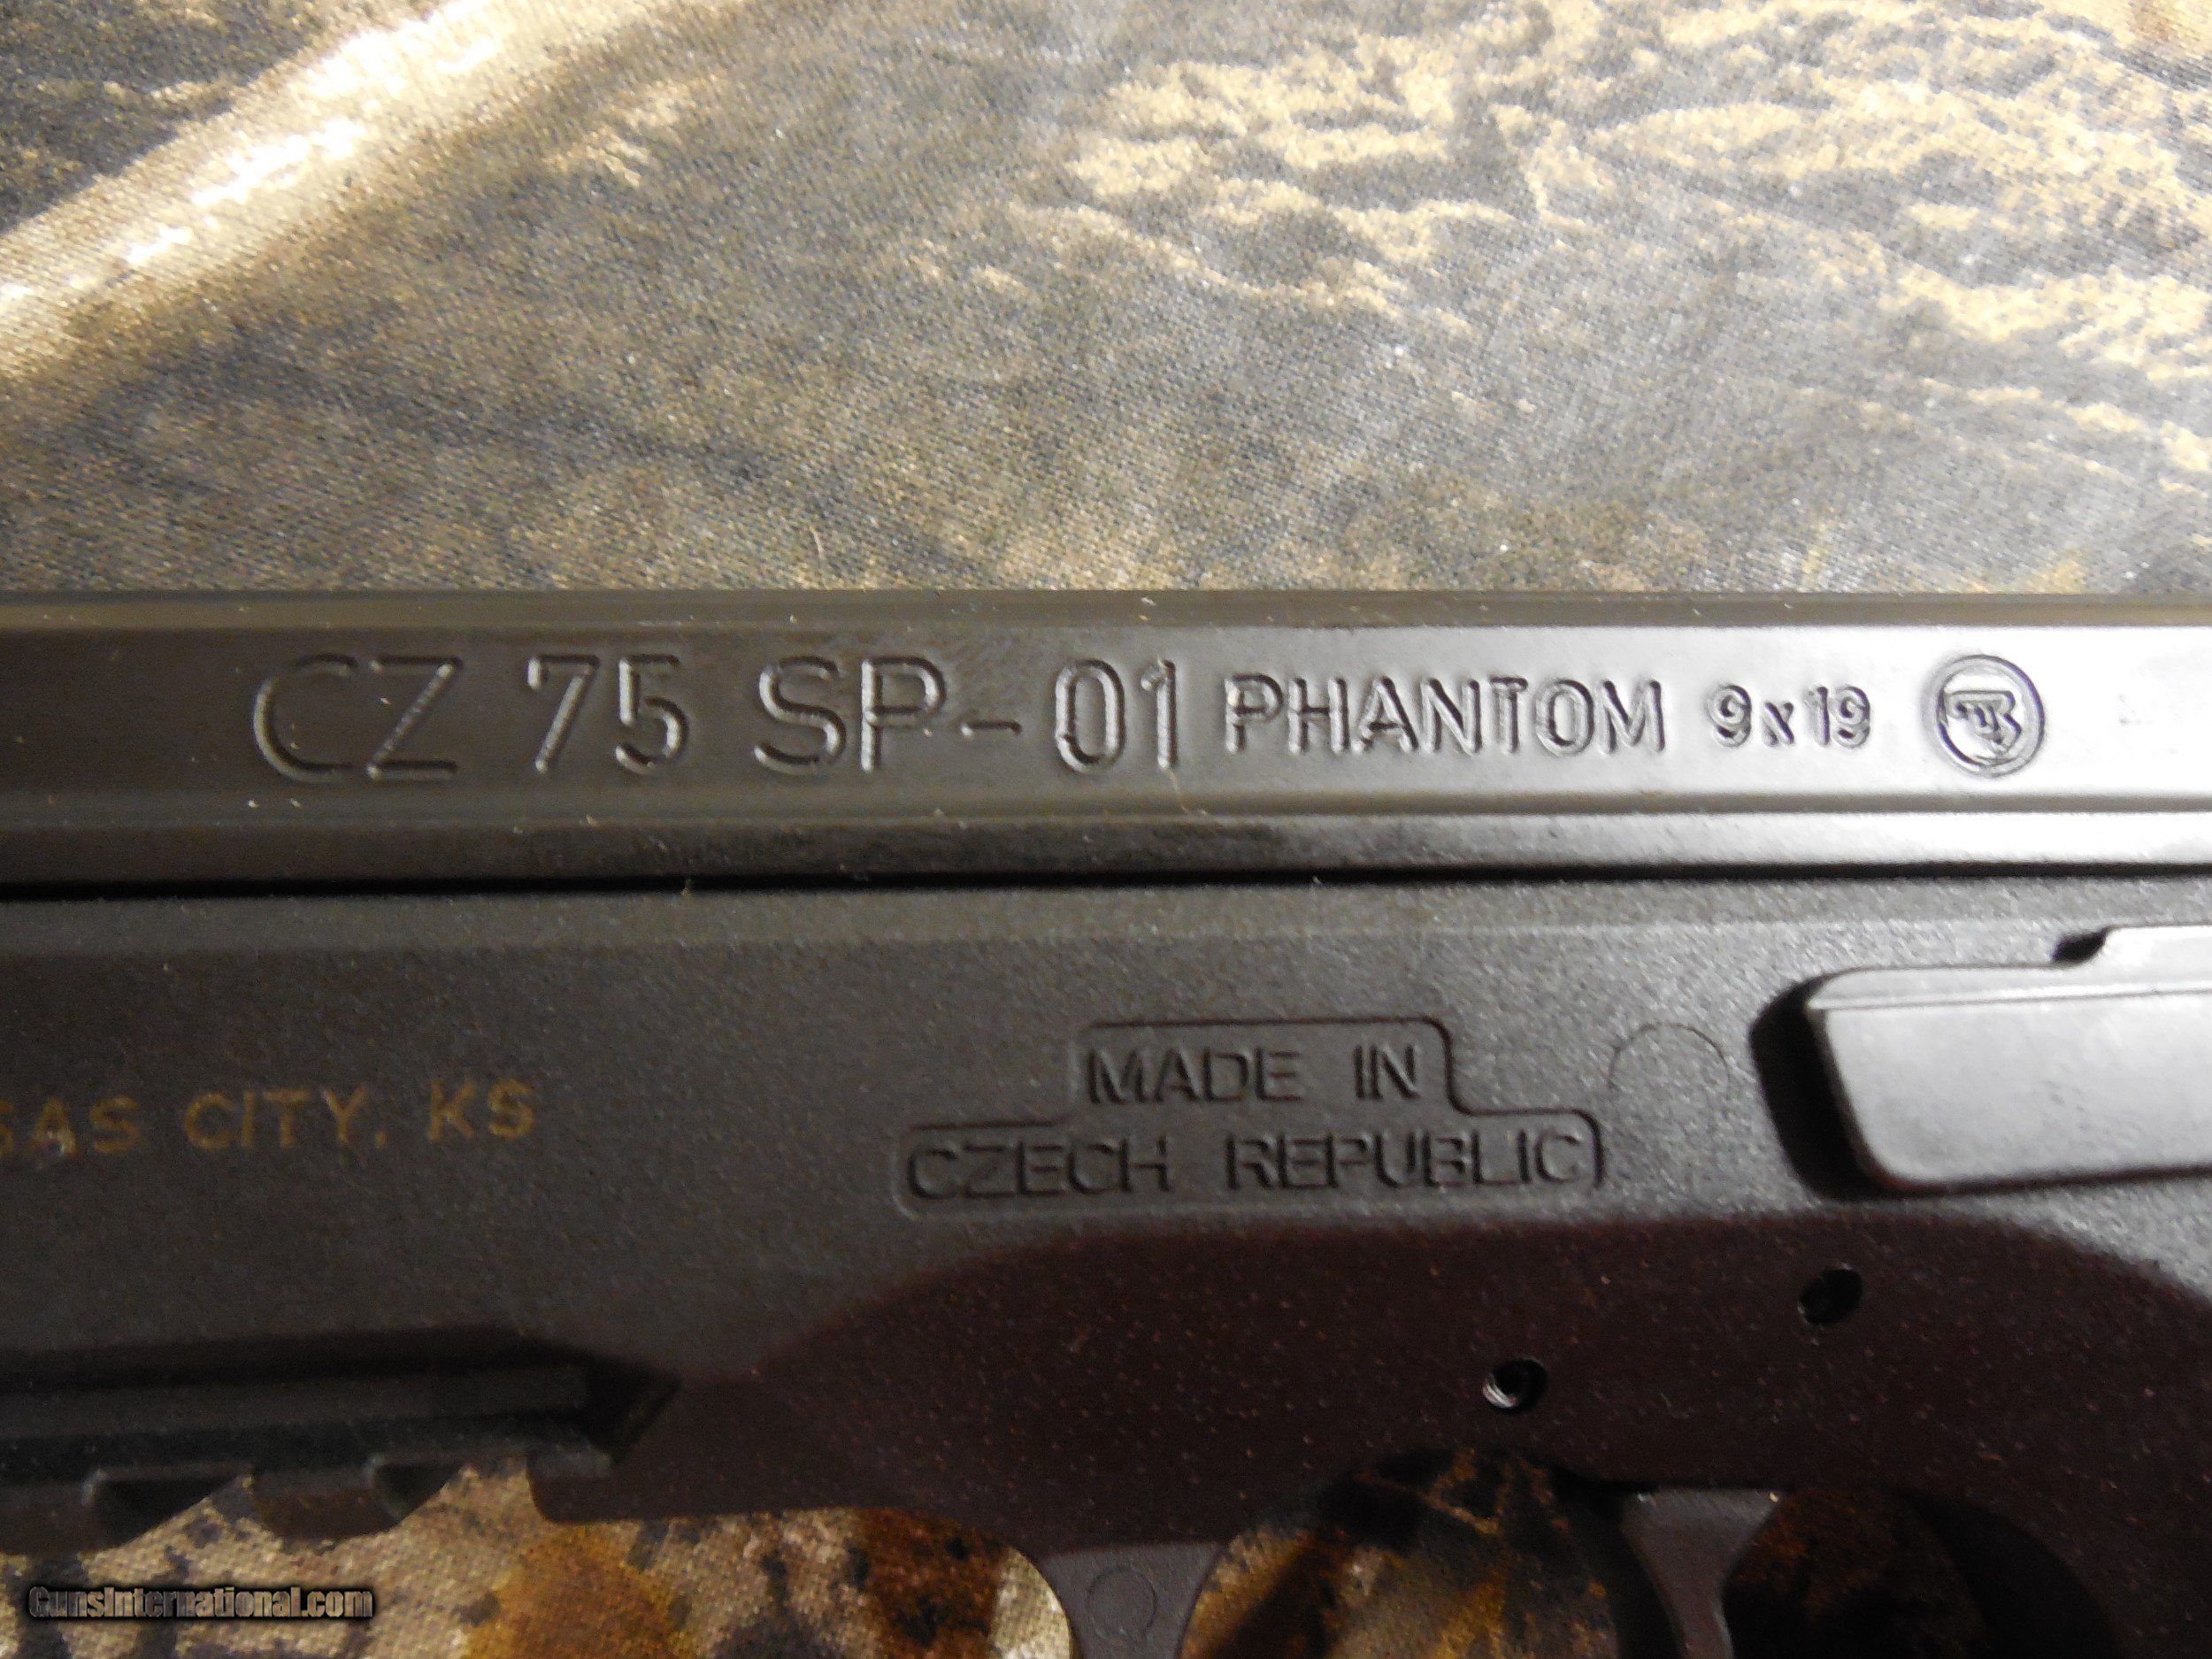 CZ 75 SP-01, PHANTOM, FS, 9-MM, 2 - 18 + 1 RD  MAGAZINES, COMBAT